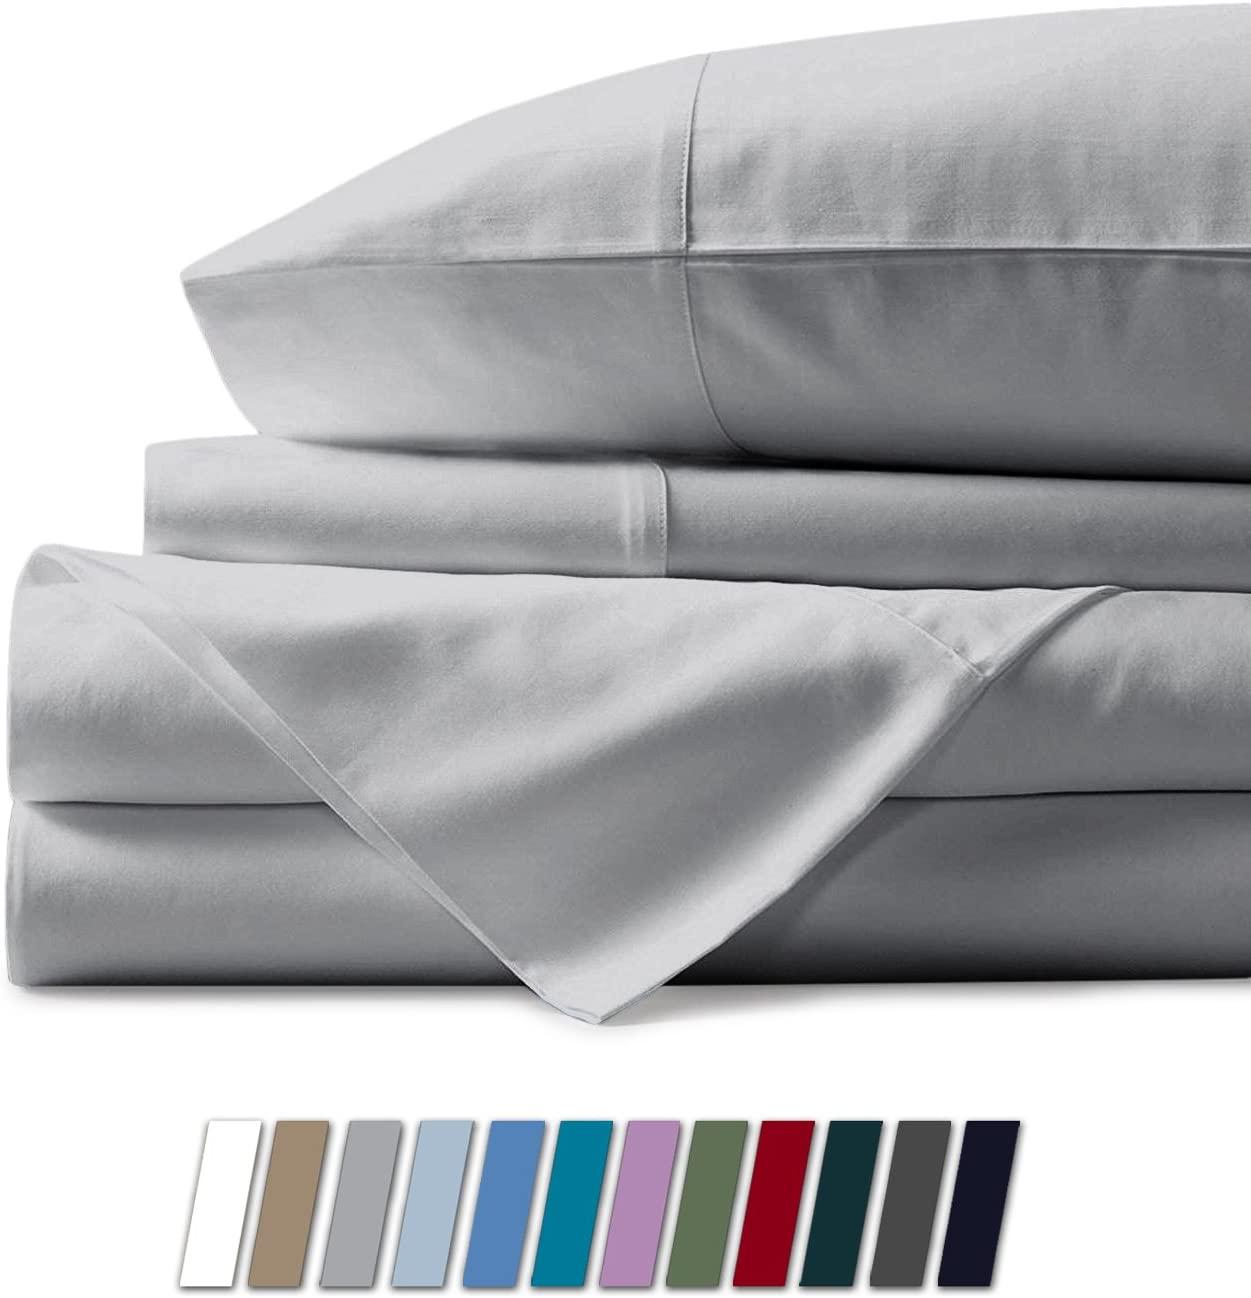 Mayfair Linen 1000 Thread Count Best Bed Sheets 100% Egyptian Cotton Sheets Set - Silver Long-Staple Cotton Queen Sheet for Bed, Fits Mattress Upto 18'' Deep Pocket, Soft & Silky Sateen Weave Sheets